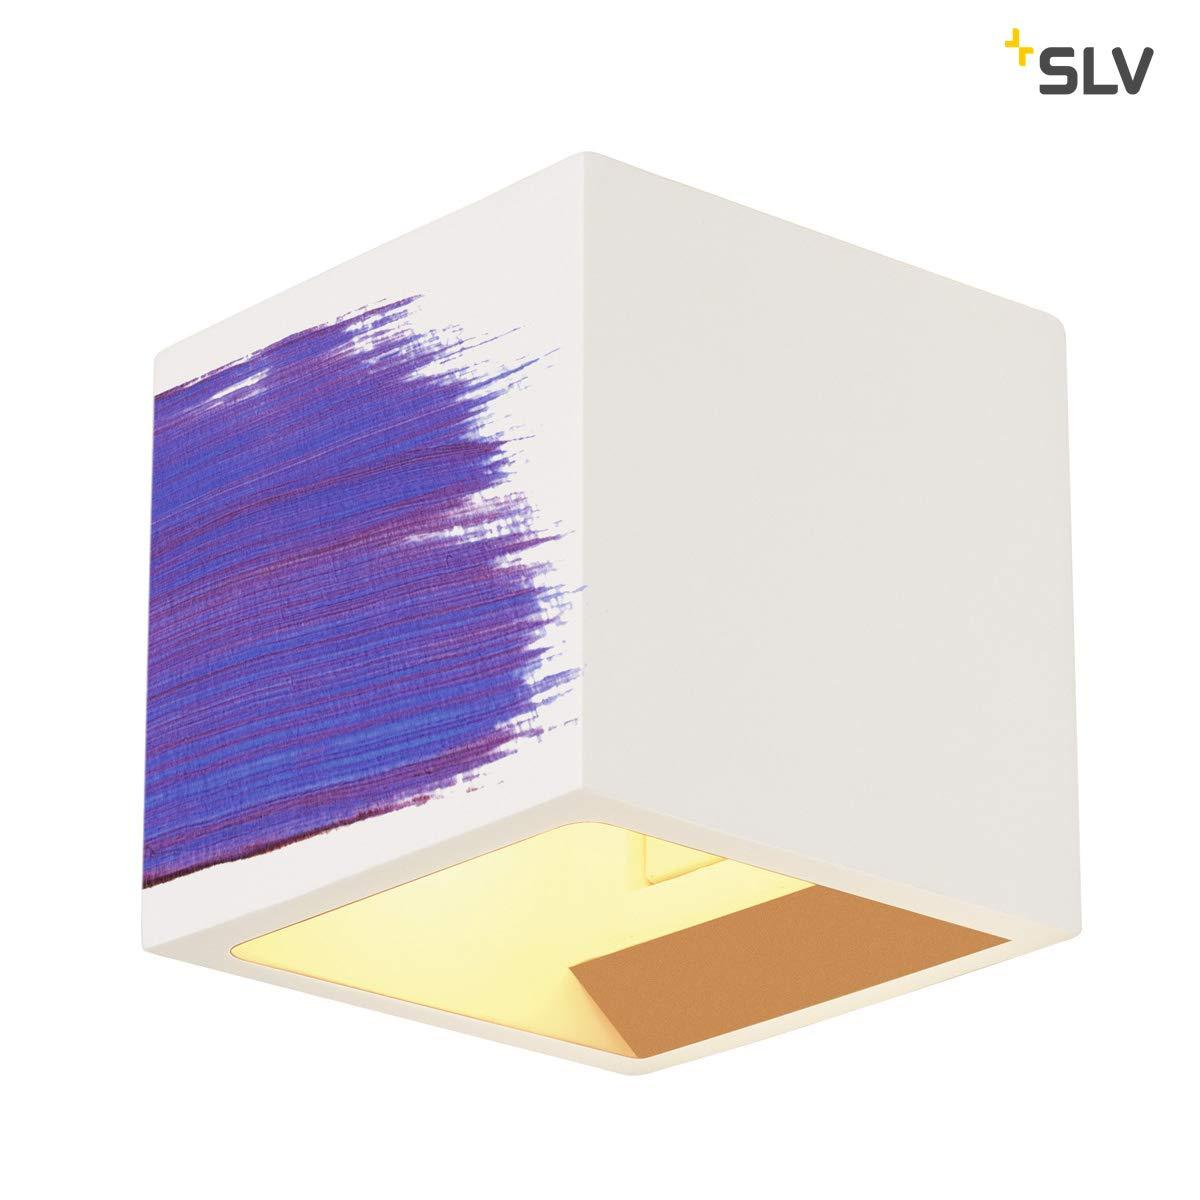 Plastra 42 MuralePlâtre Carré Maximum W BlancG9 Applique Cube 2EHD9YIeW